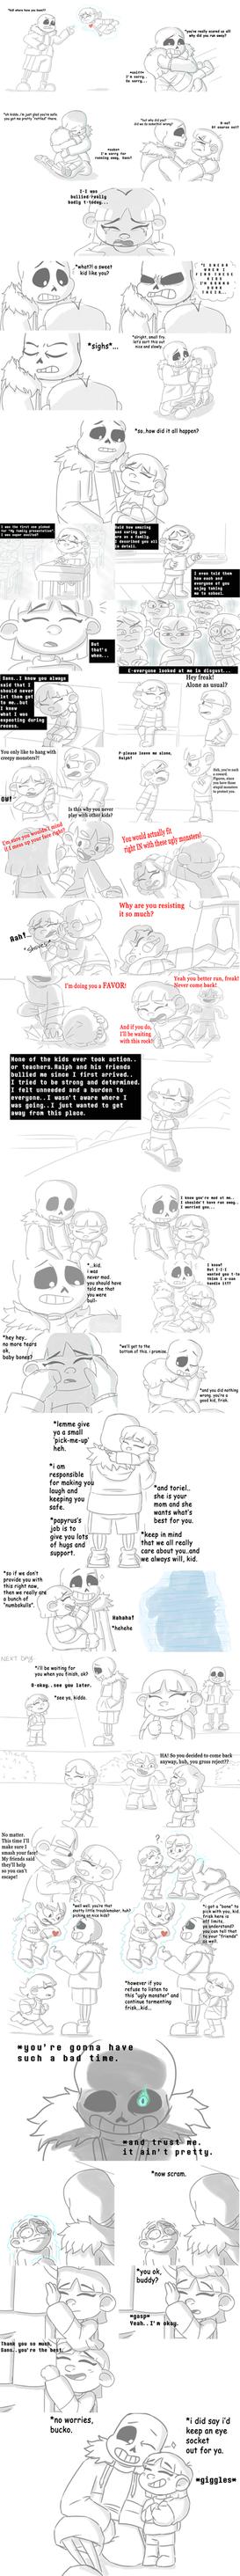 Undertale // Bullied (comic) by BroGirl62